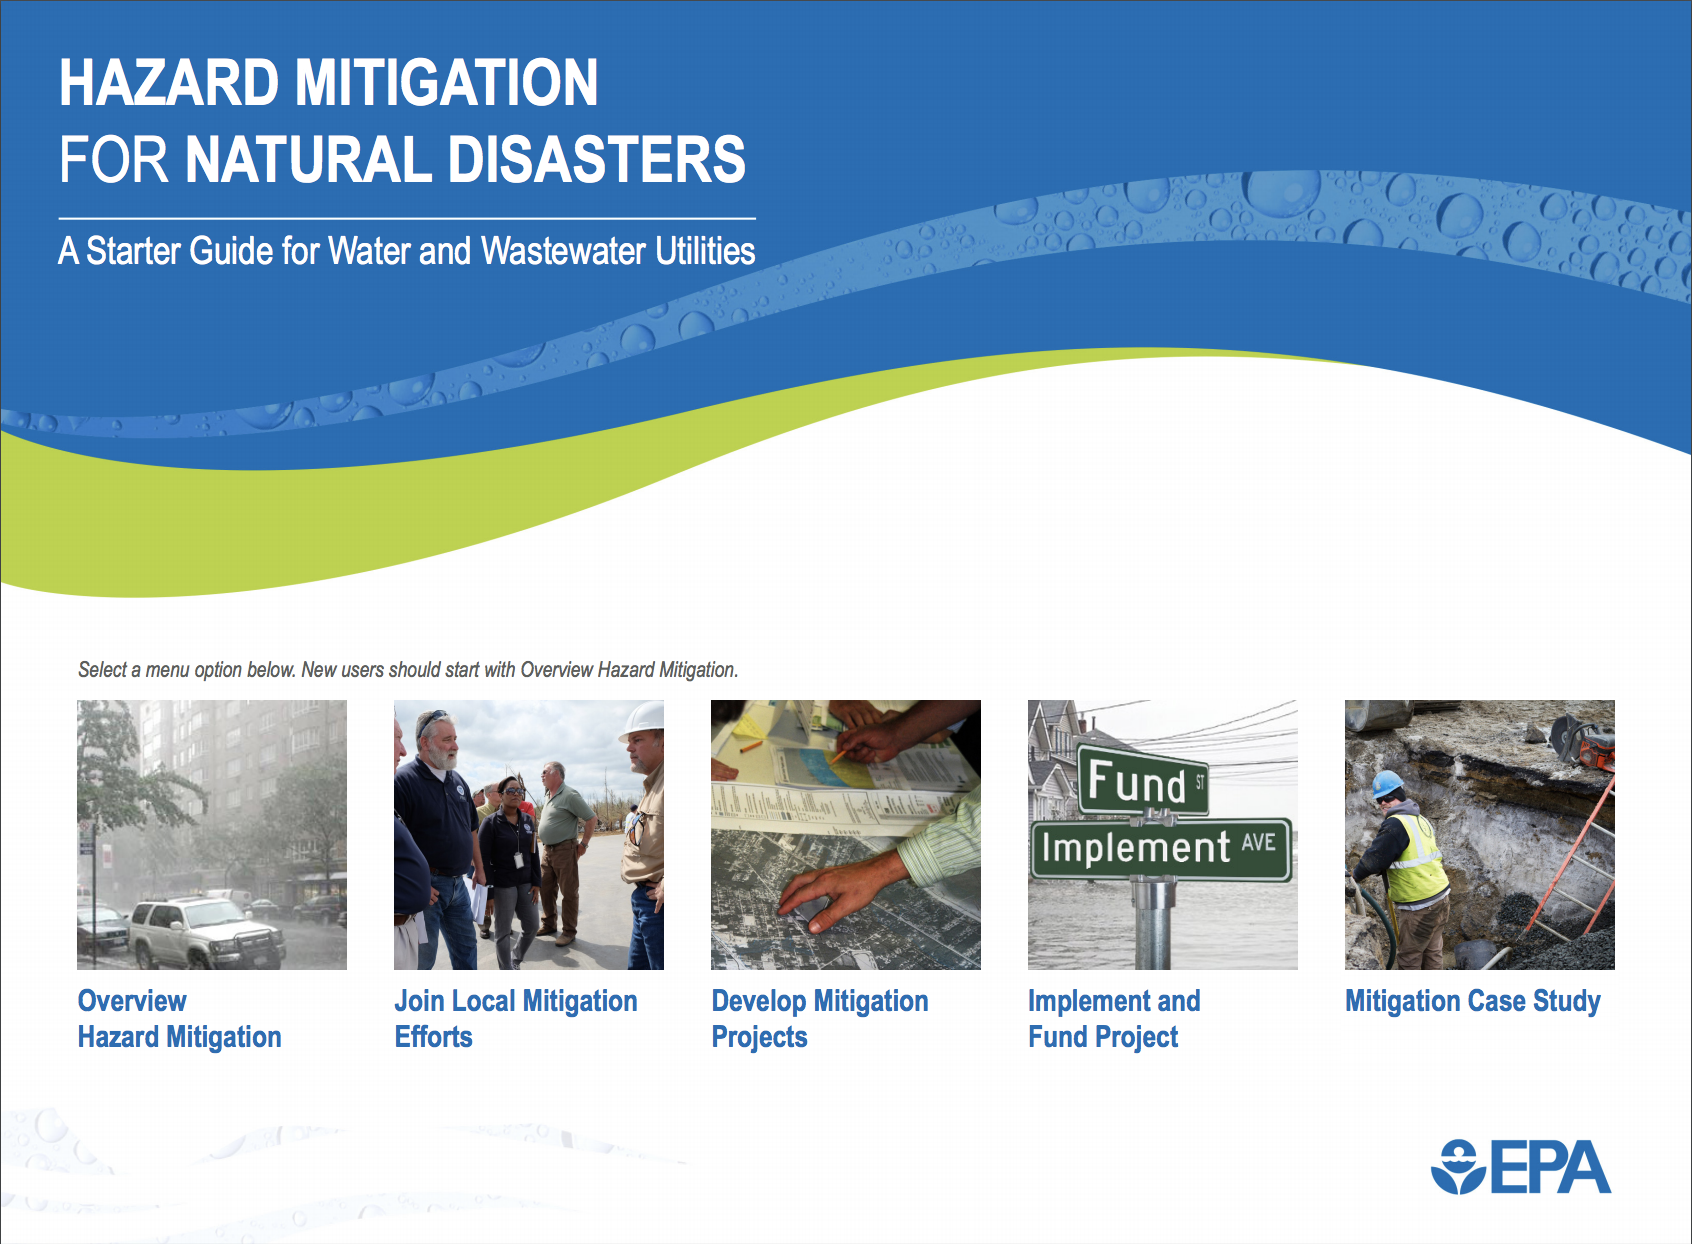 https://www.epa.gov/sites/production/files/2016-08/documents/160815-hazardmitigationfornaturaldisasters.pdf